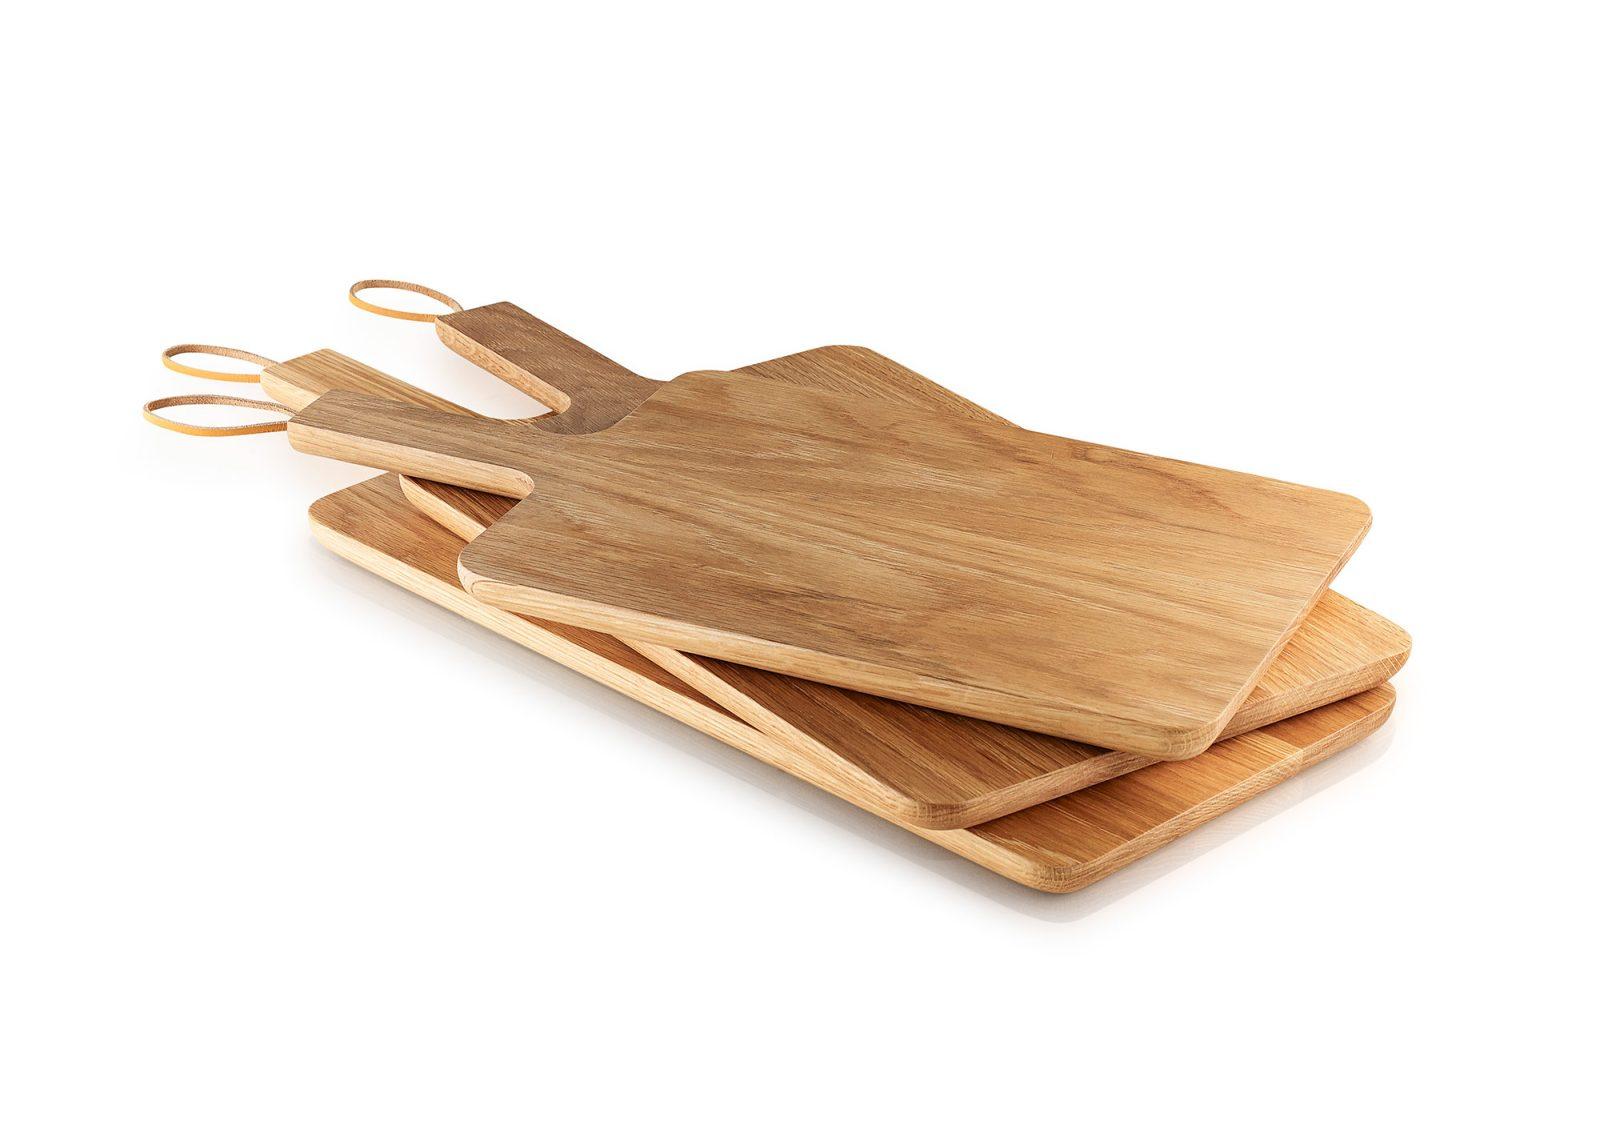 Nordic Kitchen, Wooden Cutting Board